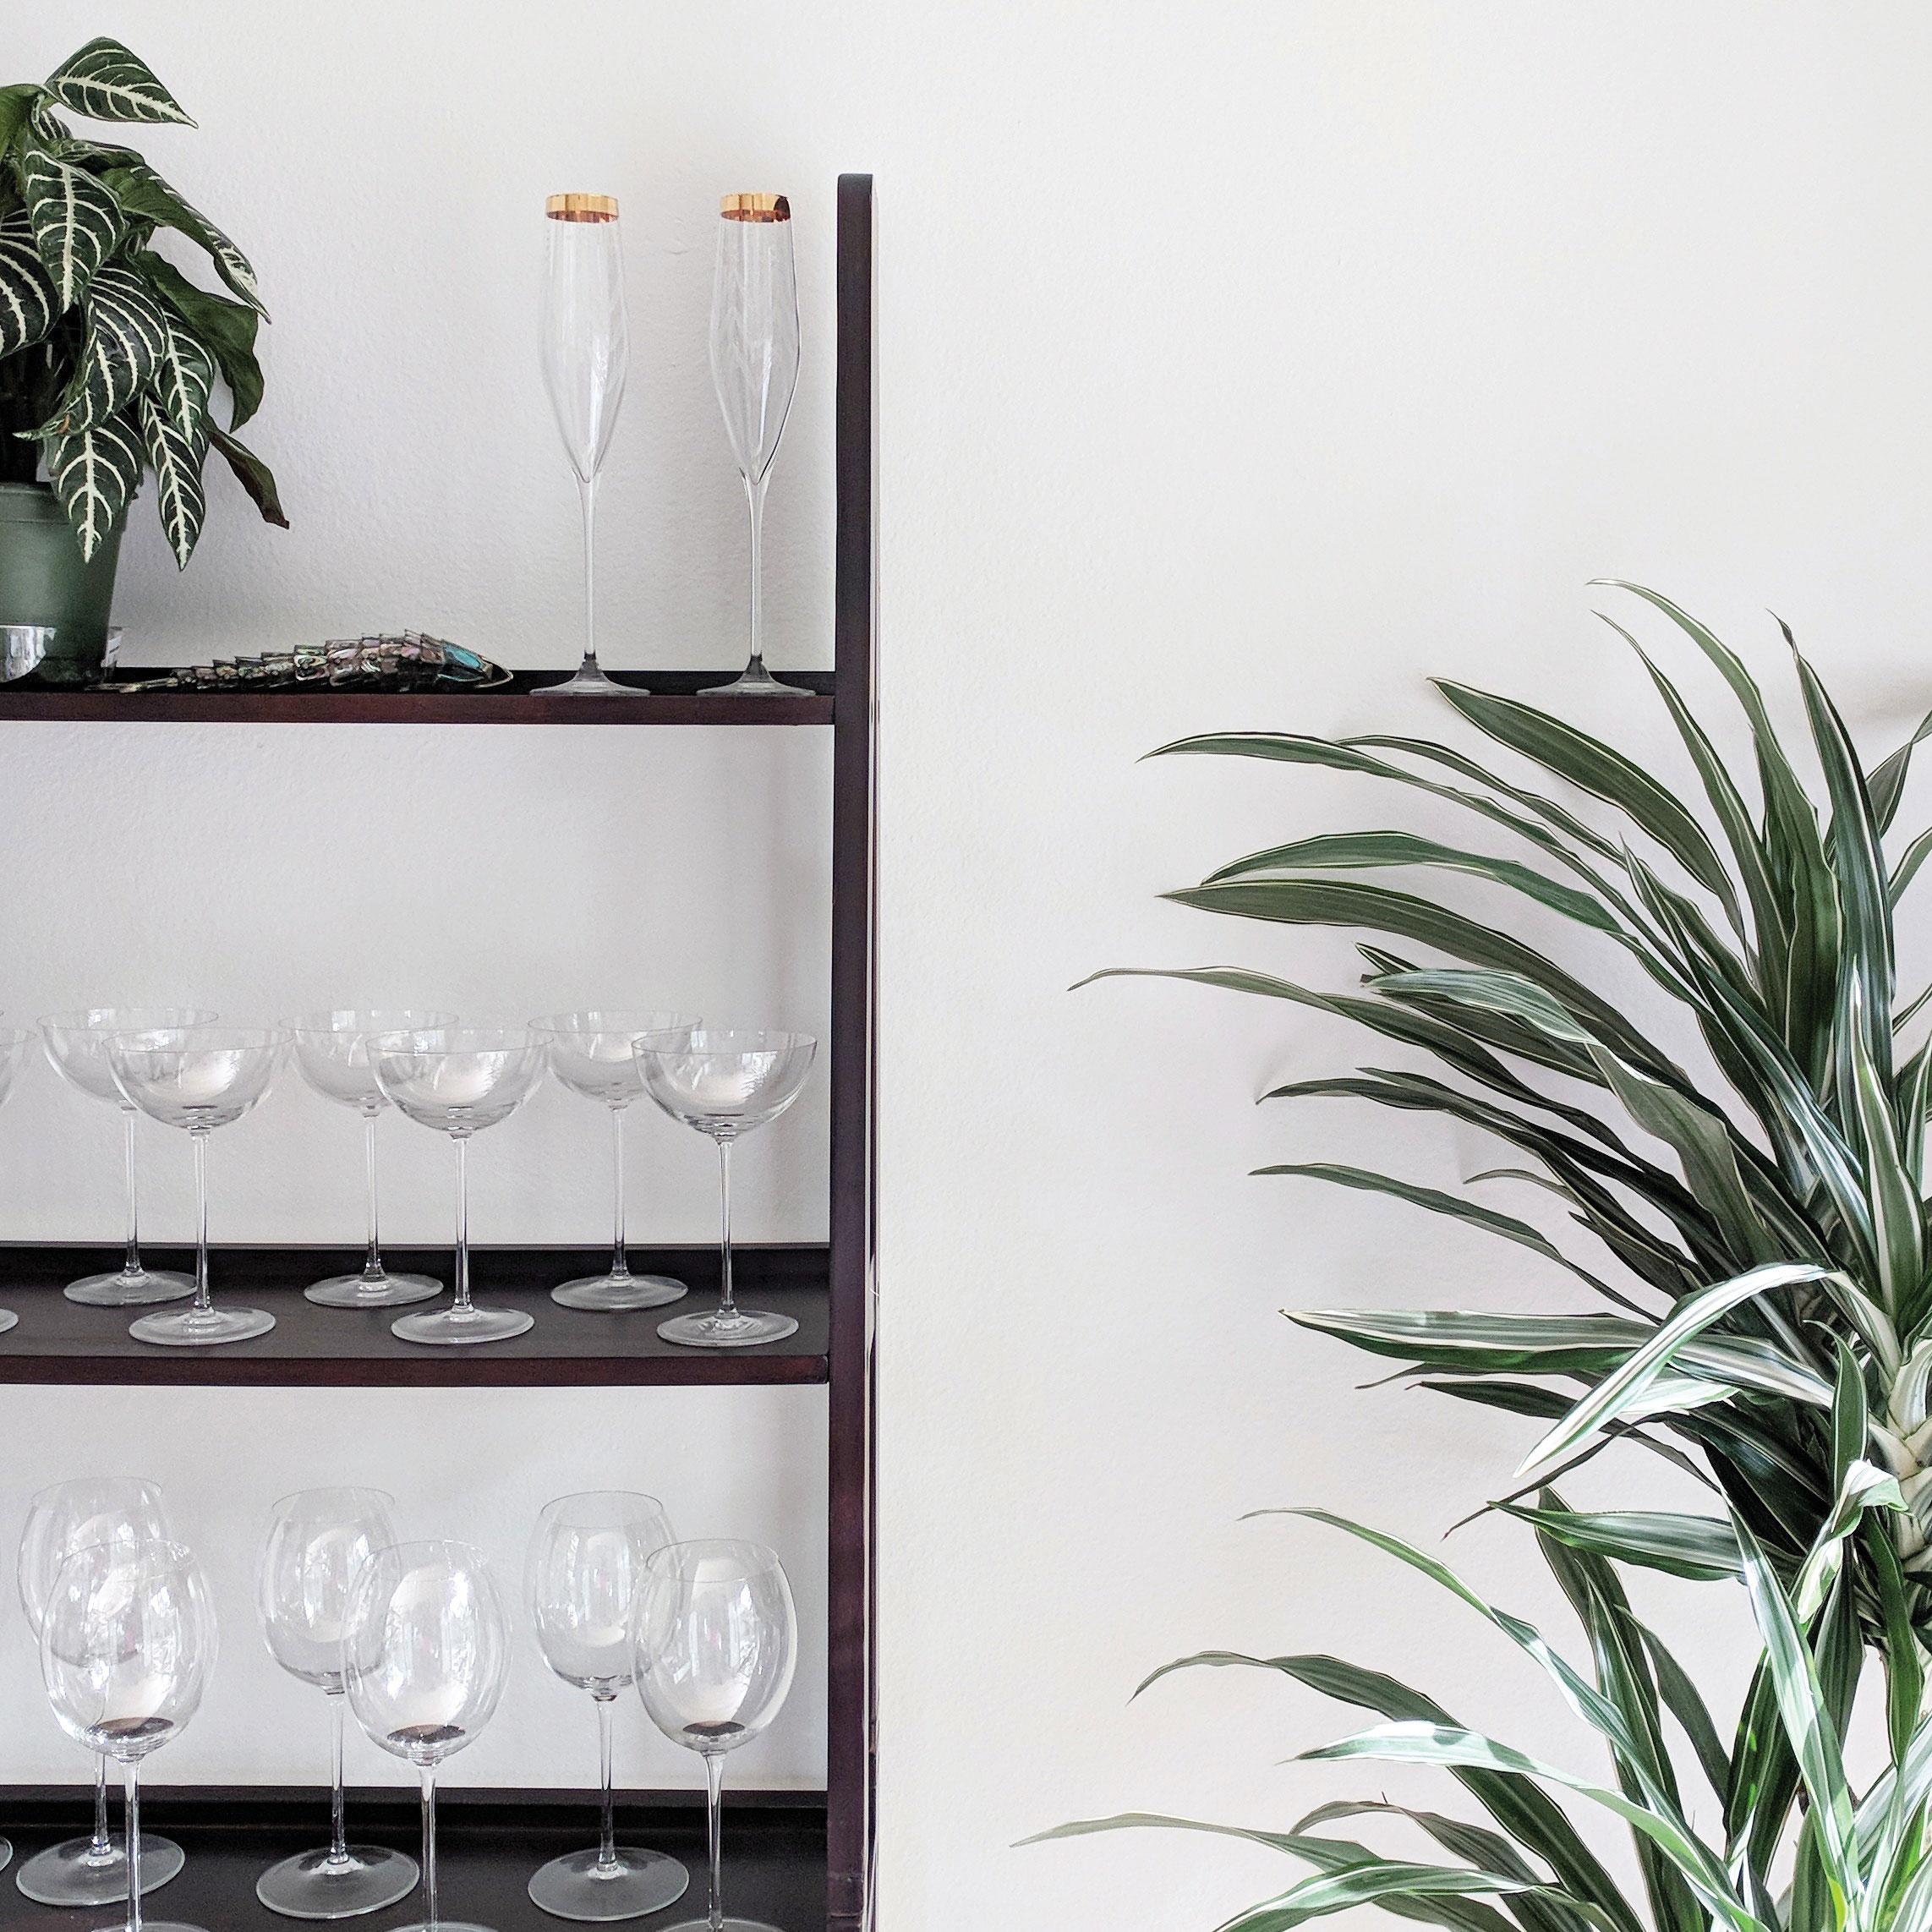 kait schulhof san diego sustainability decorate with indoor plants minimal